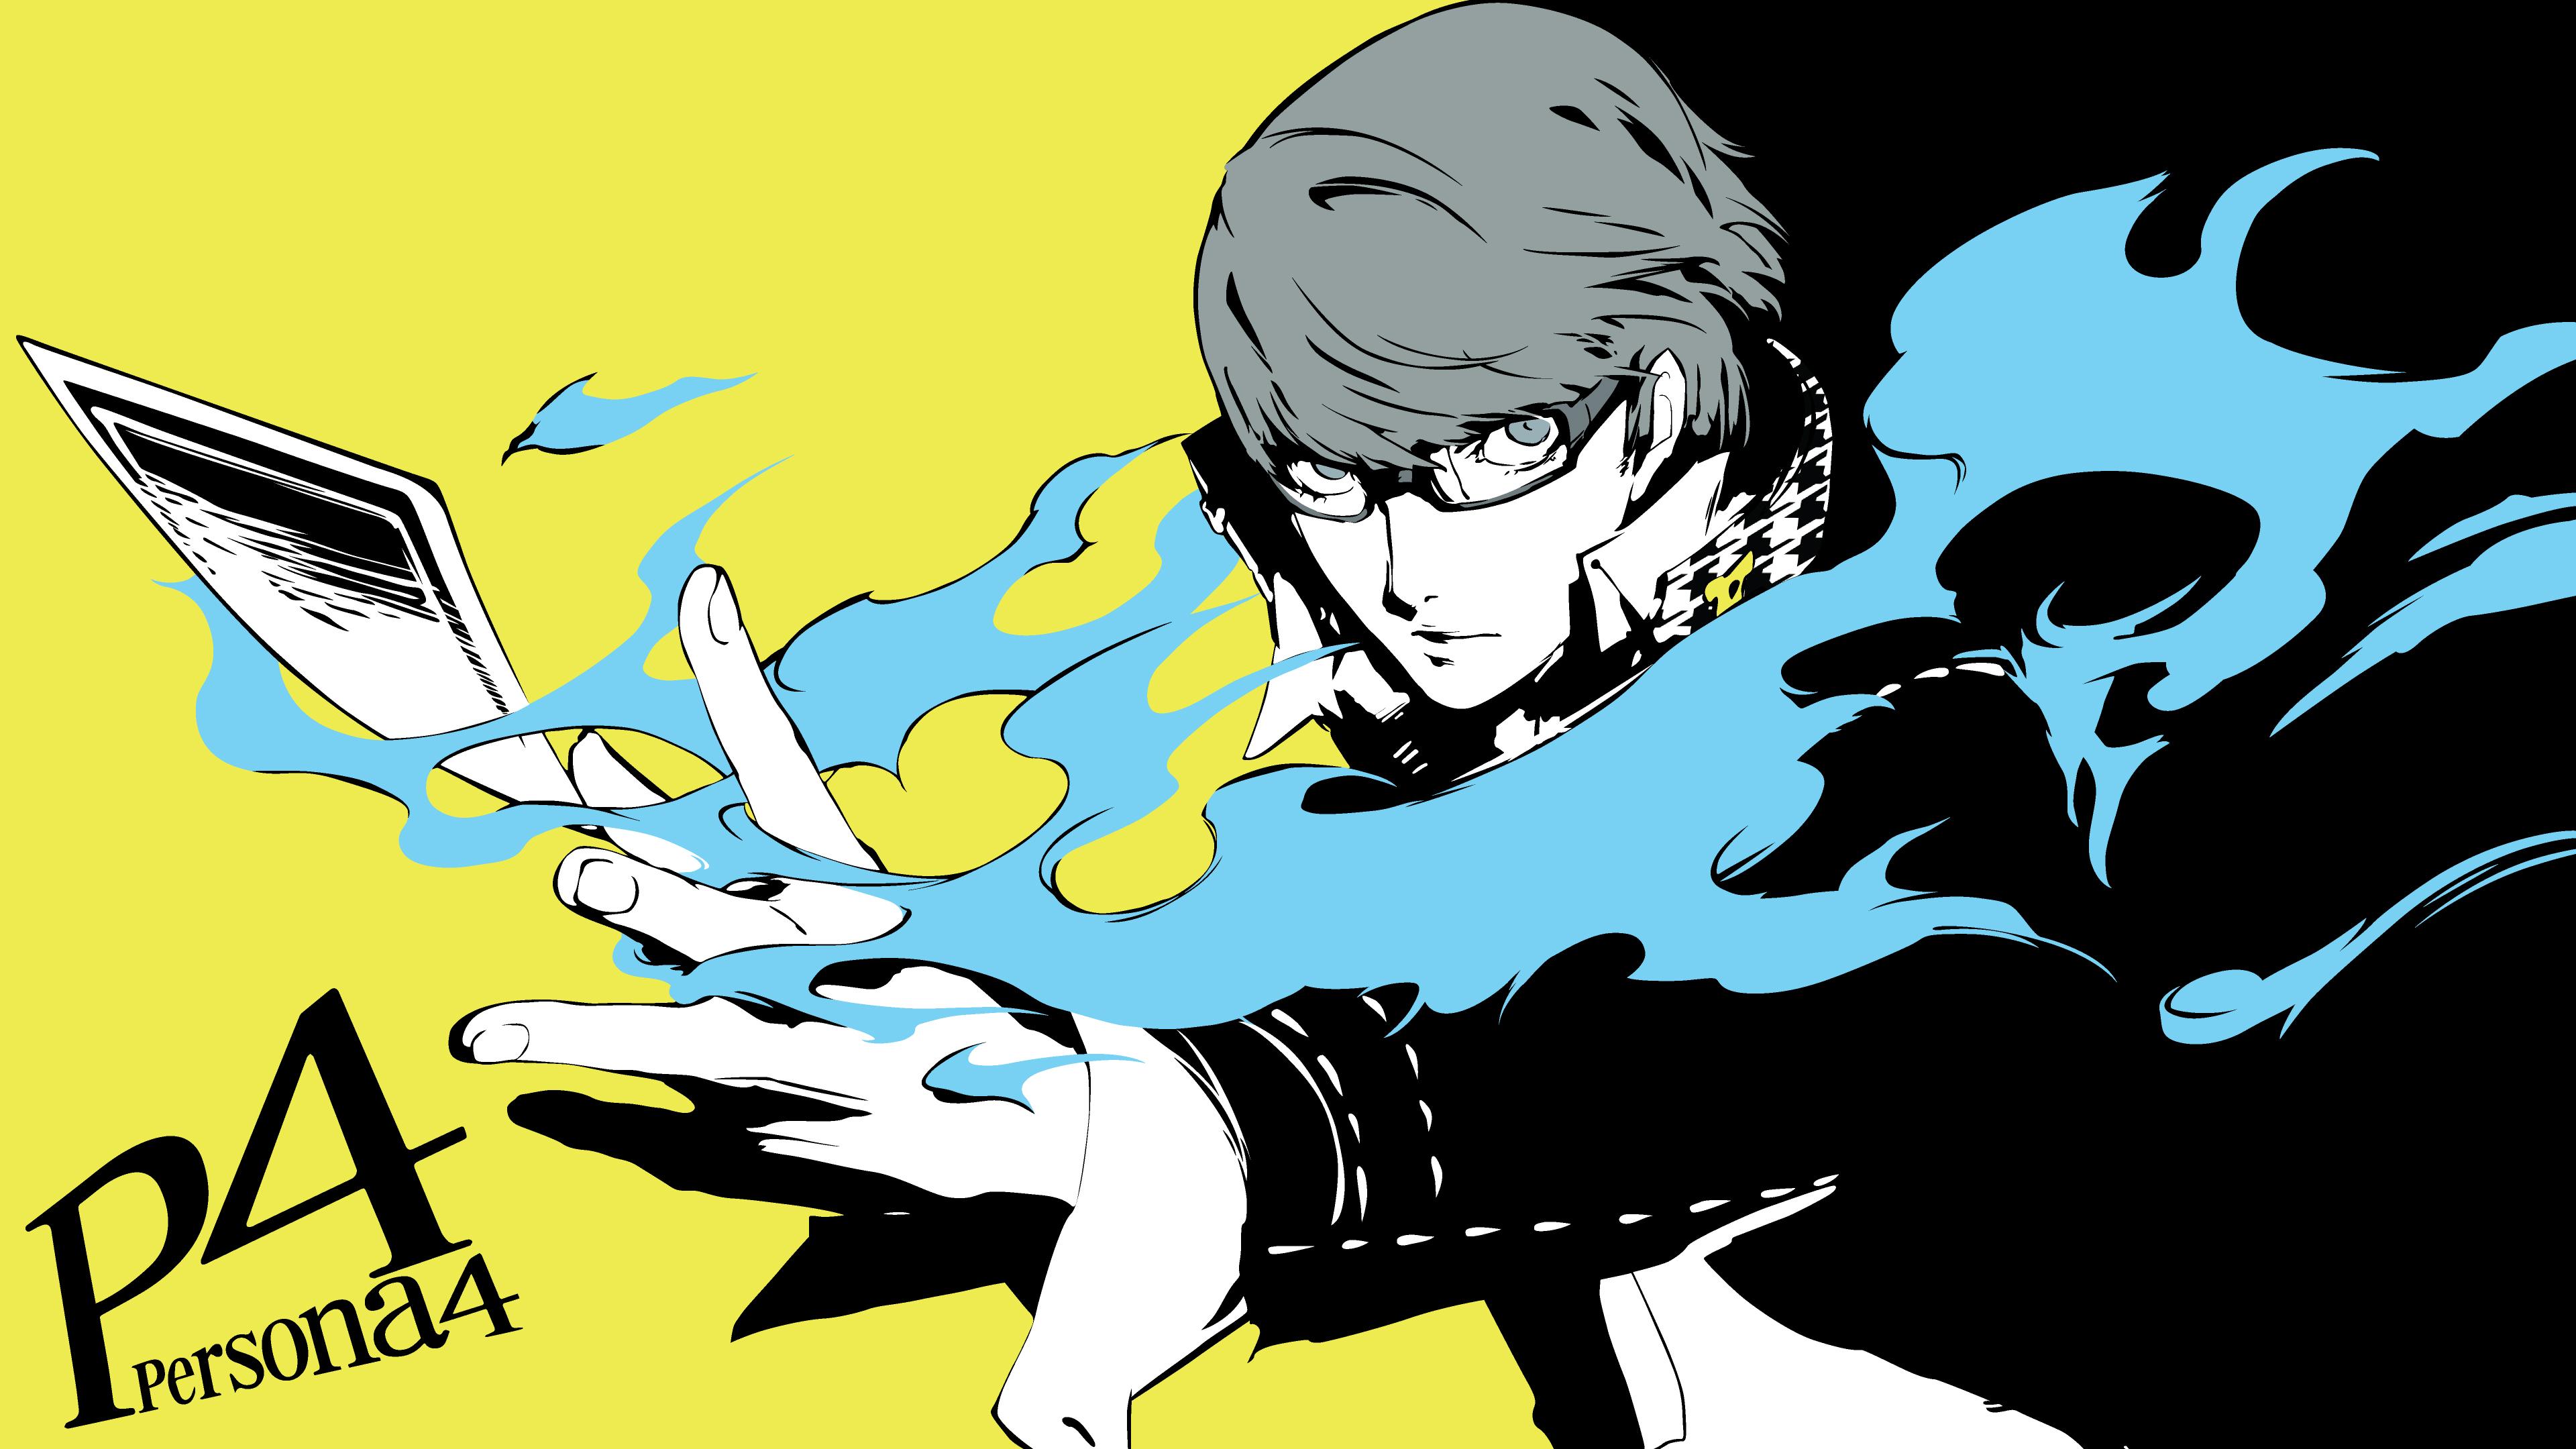 Yu Narukami 4k Ultra HD Wallpaper Background Image 3840x2160 3840x2160